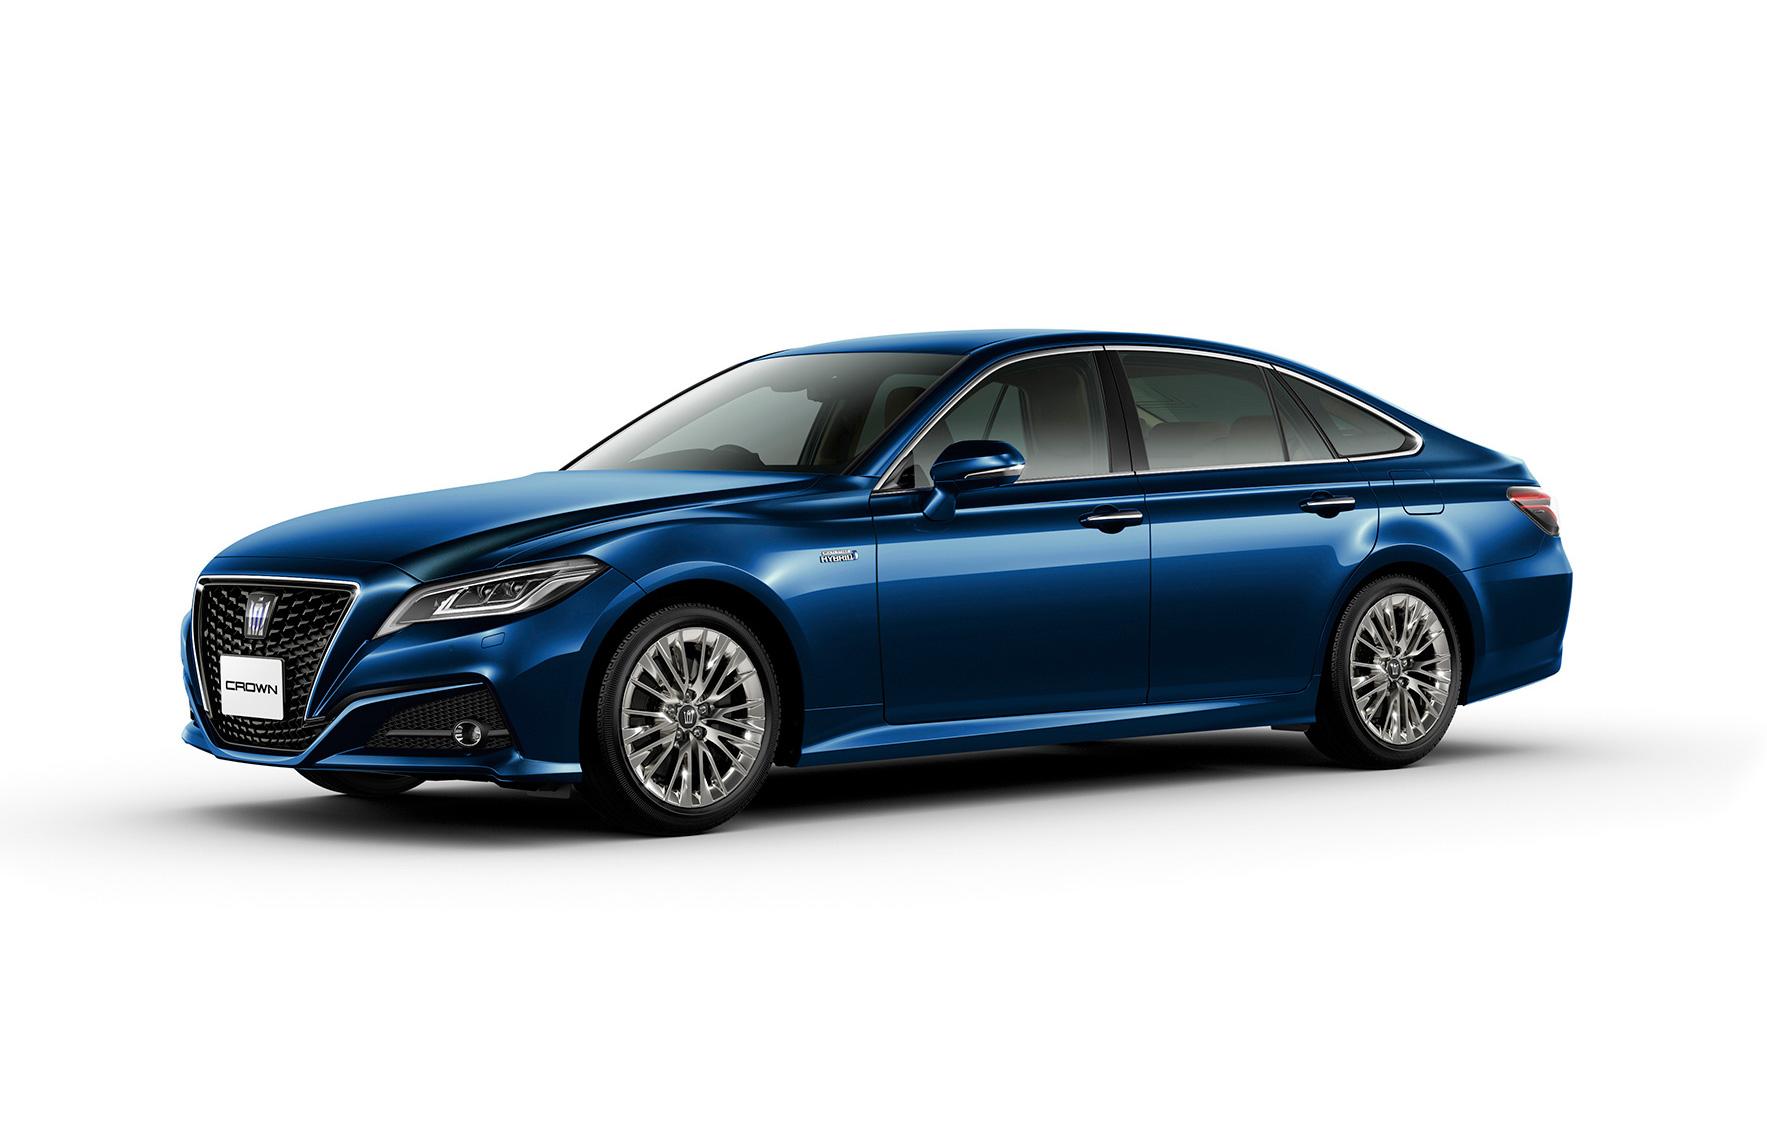 A1 Auto Sales >> 2018 Toyota Crown debuts, jumps on TNGA platform ...